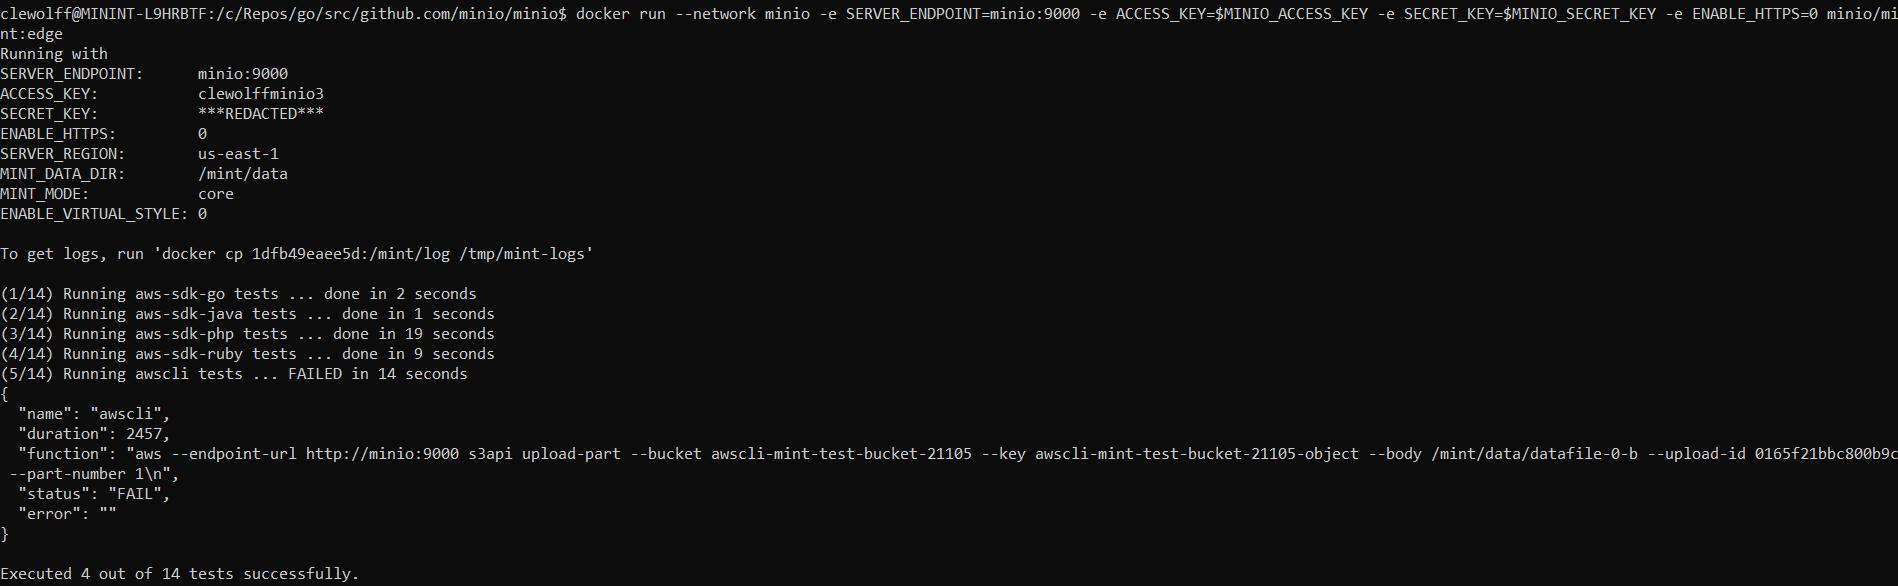 Screenshot showing minio/mint:edge failure with minio/minio:latest